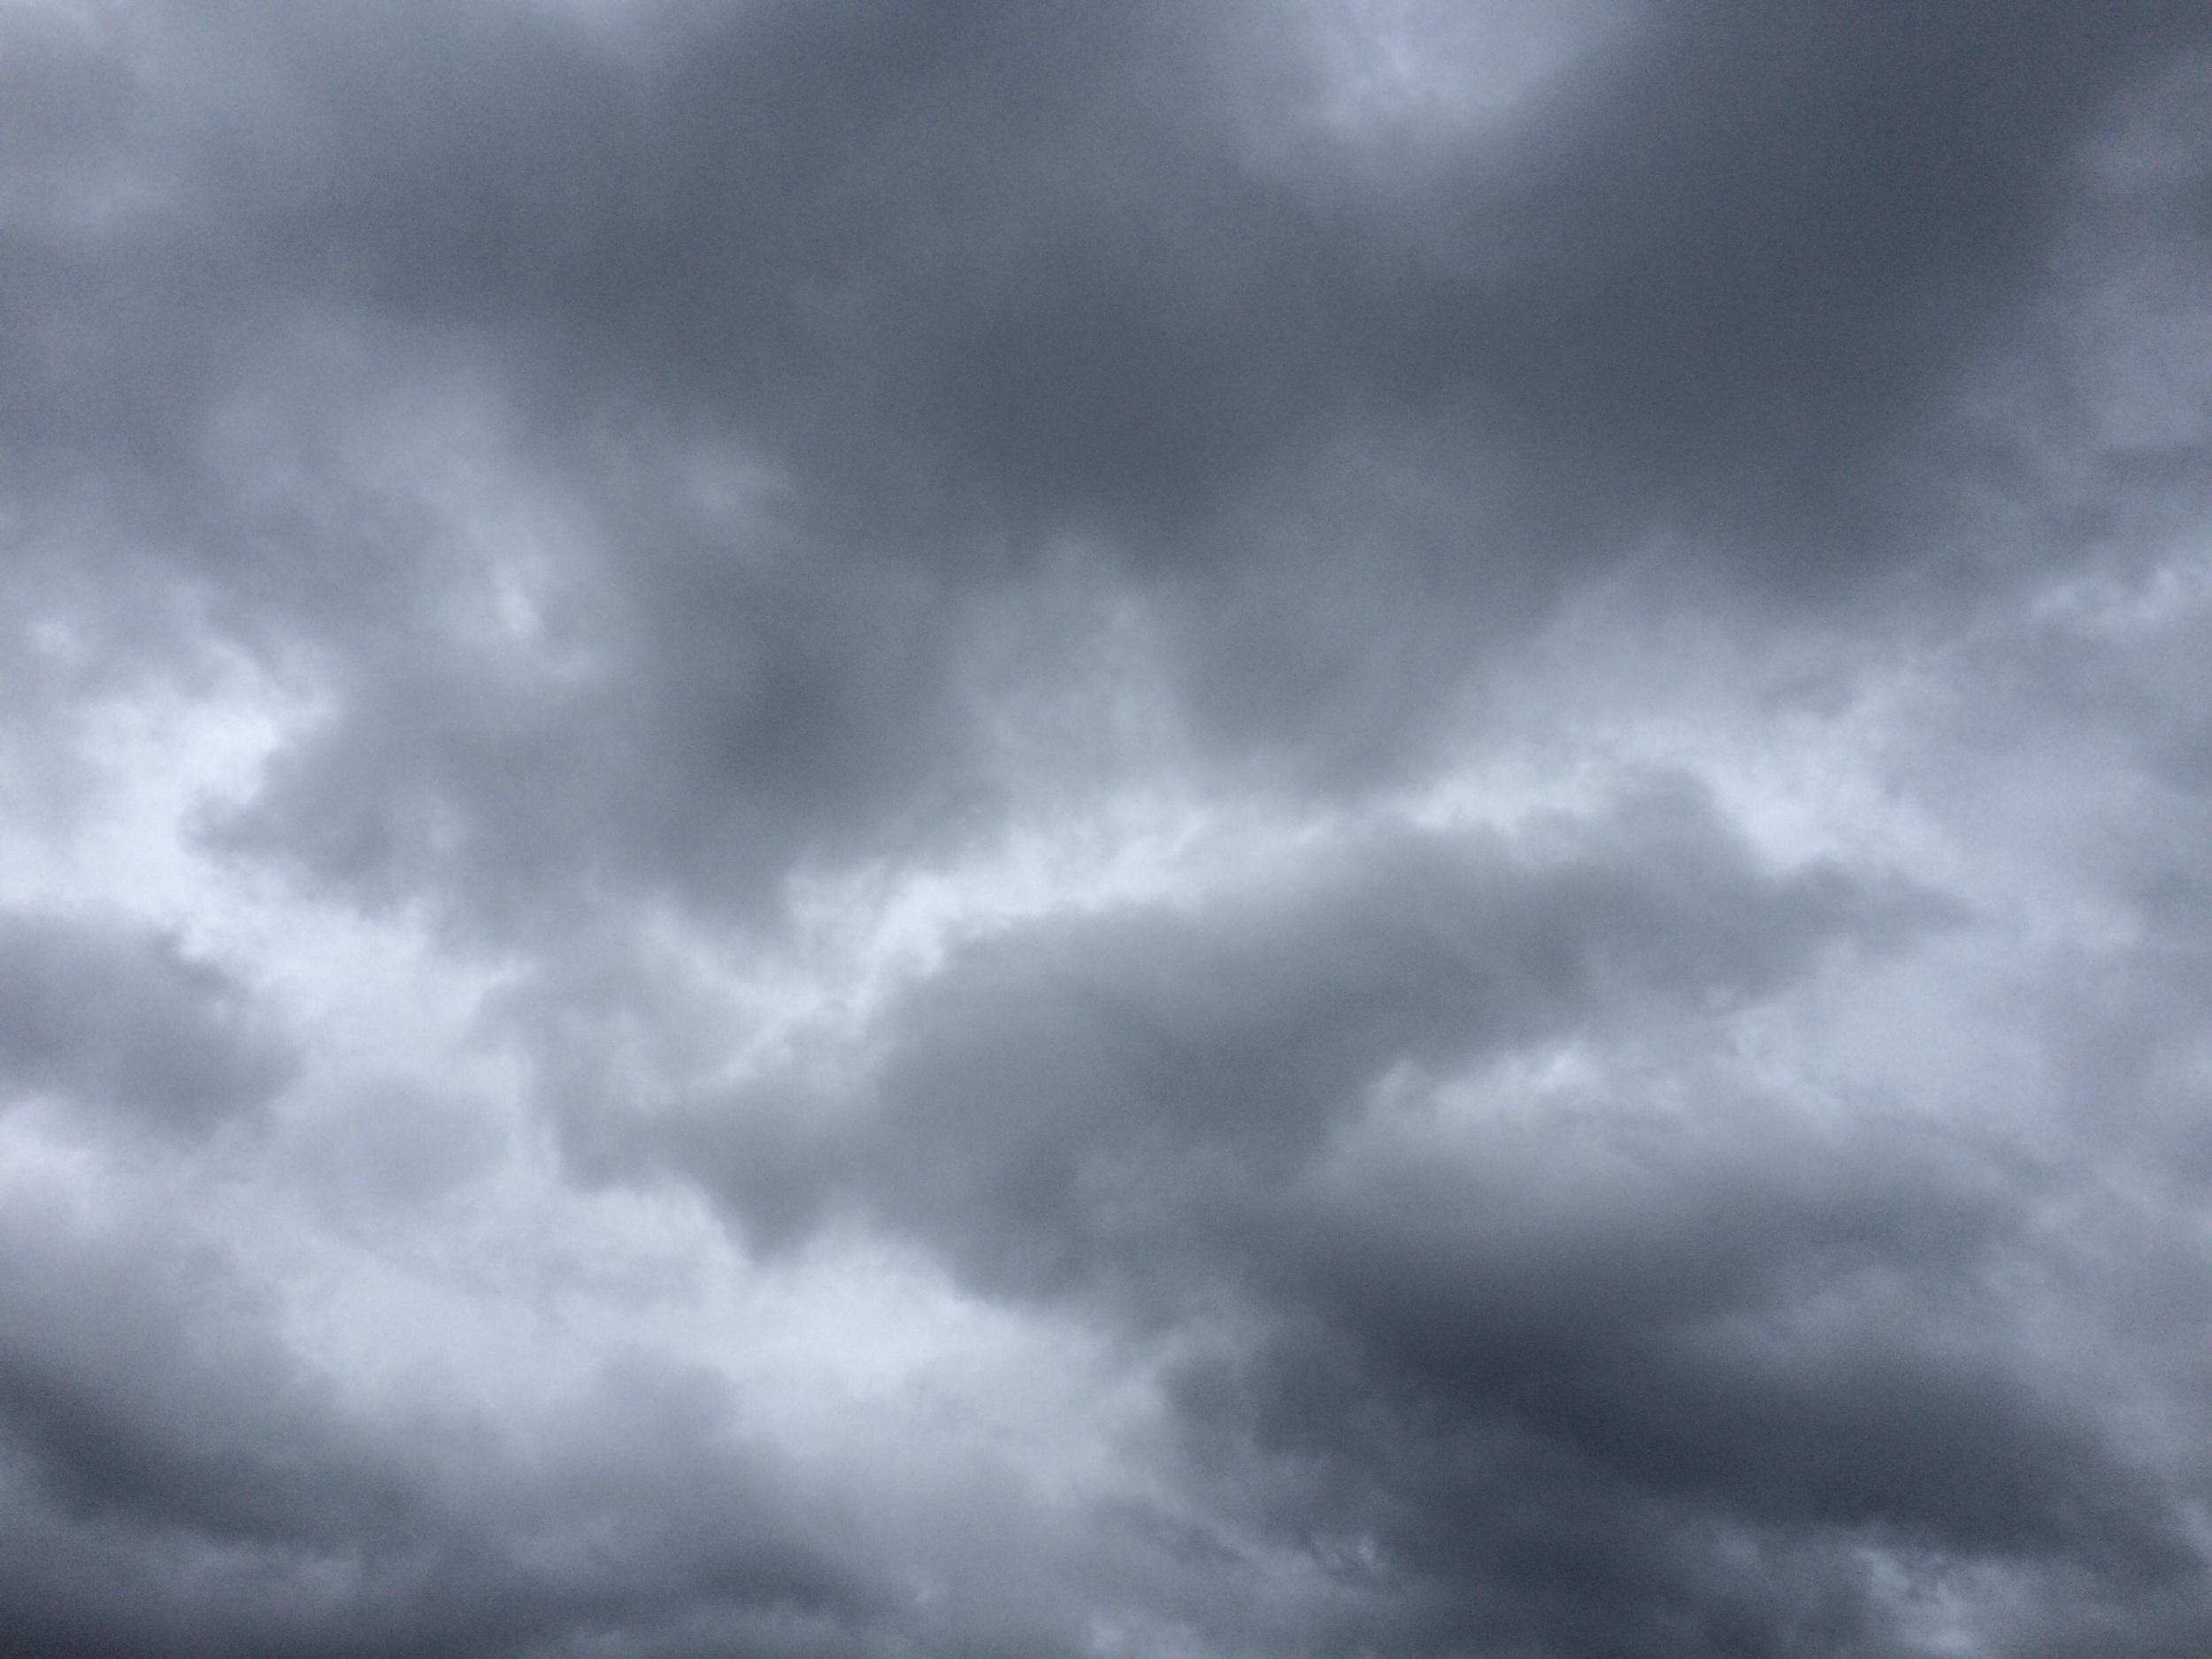 My favorite clouds